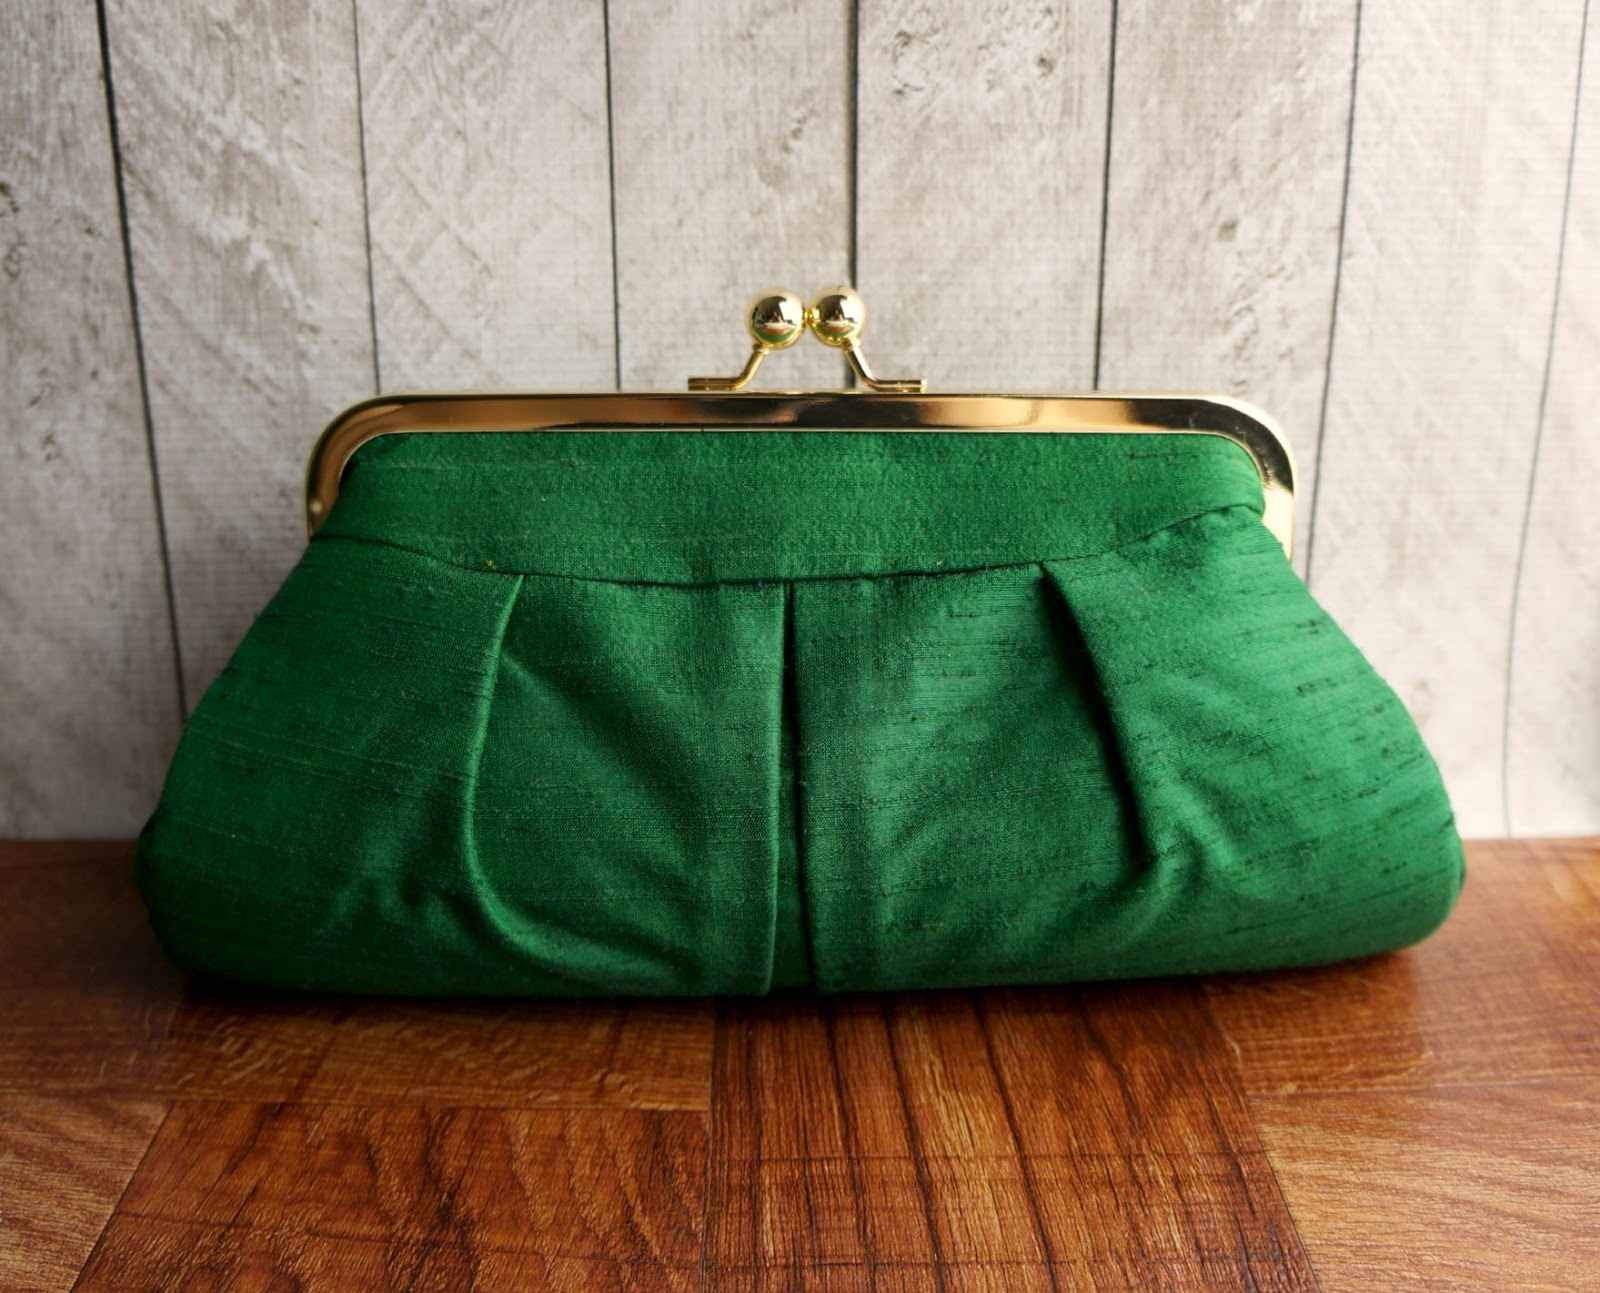 toriska bags crafts where to buy frames